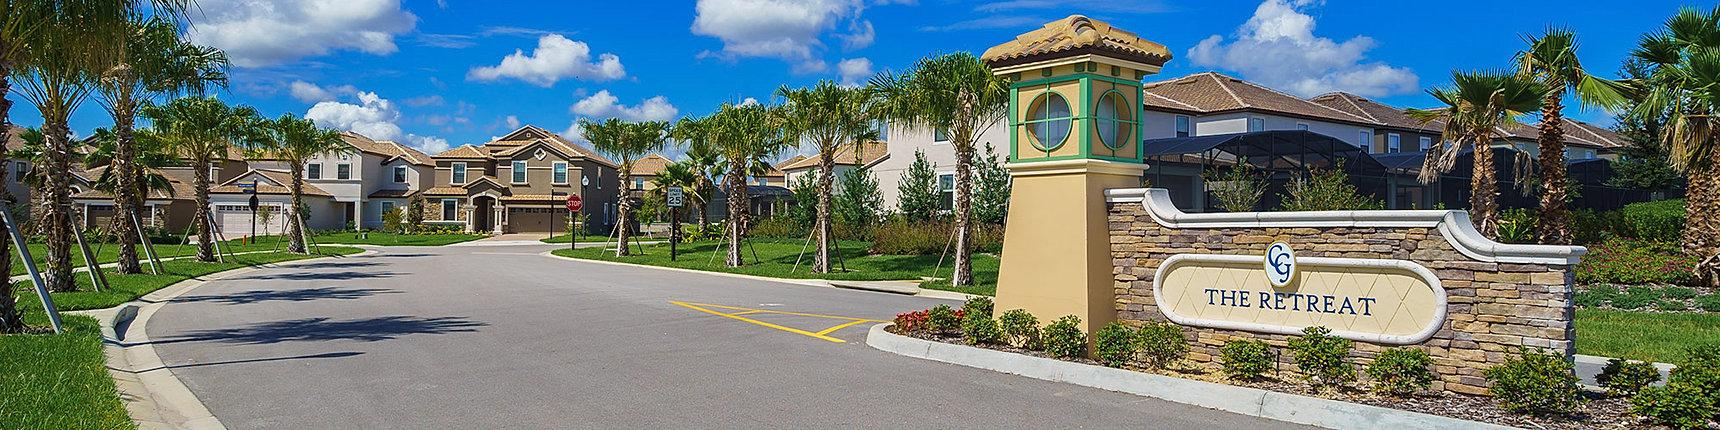 Do It Yourself Home Design: Champions Gate Villas On The Retreat Orlando